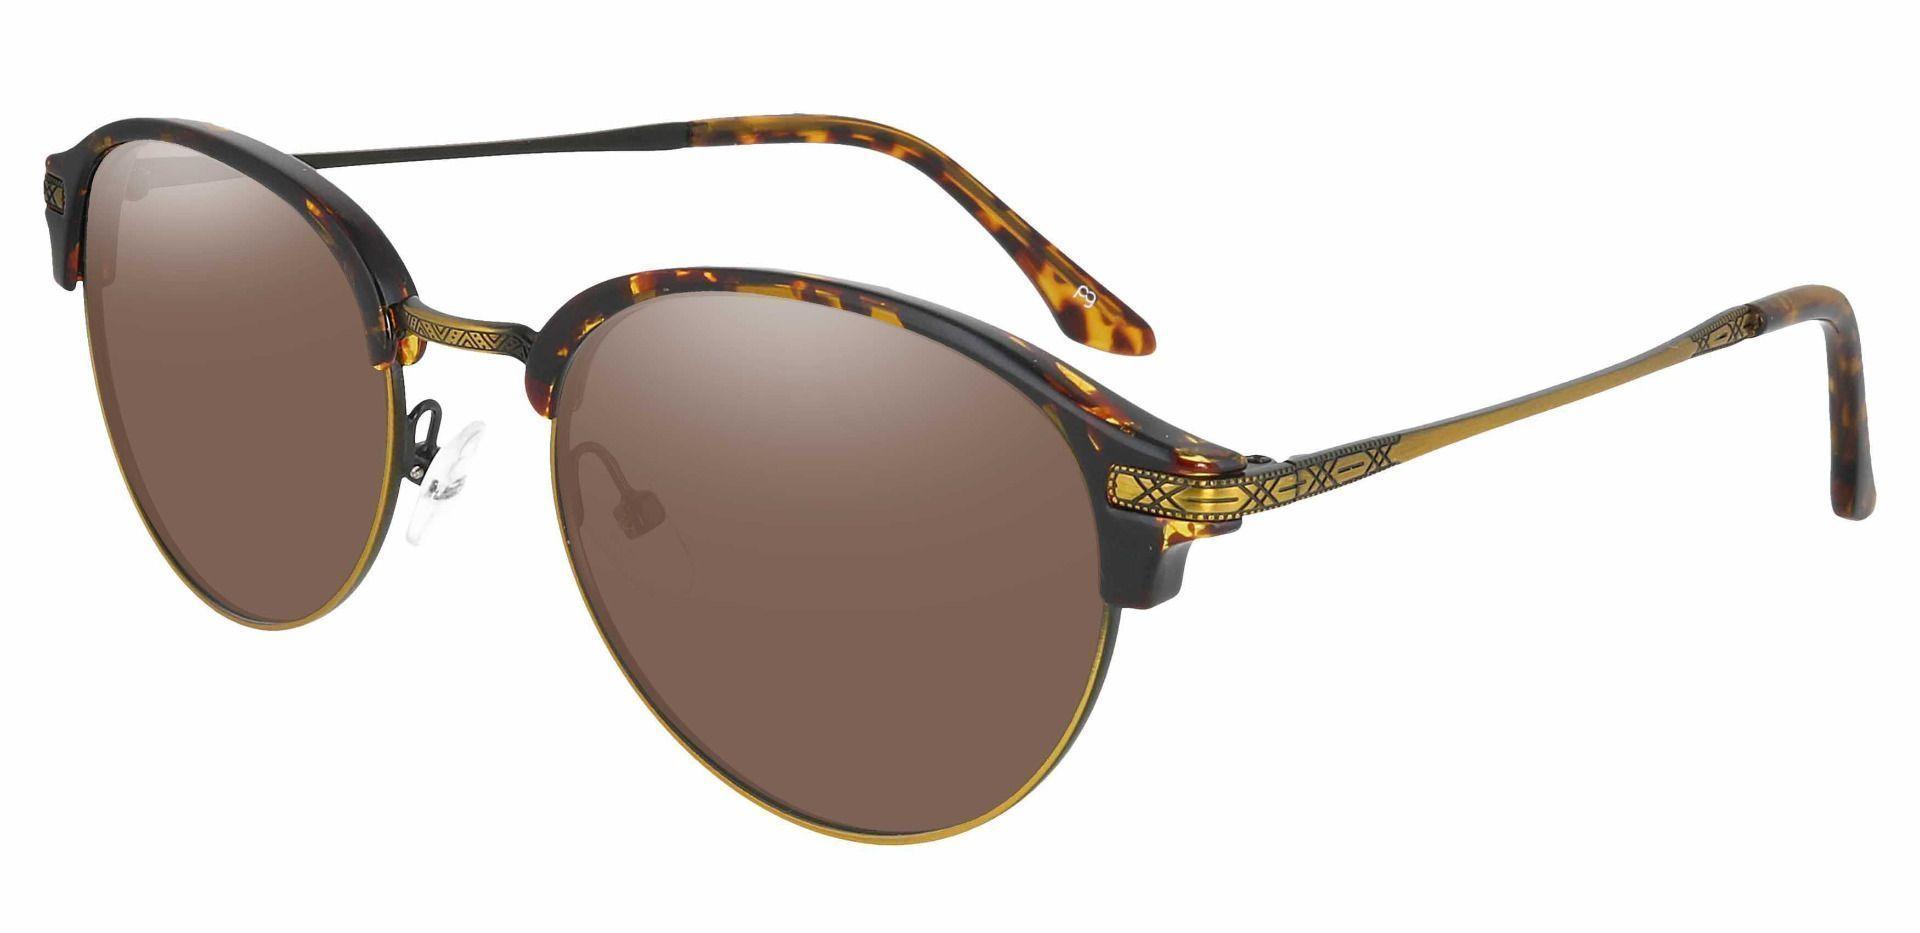 Akron Browline Progressive Sunglasses - Tortoise Frame With Brown Lenses